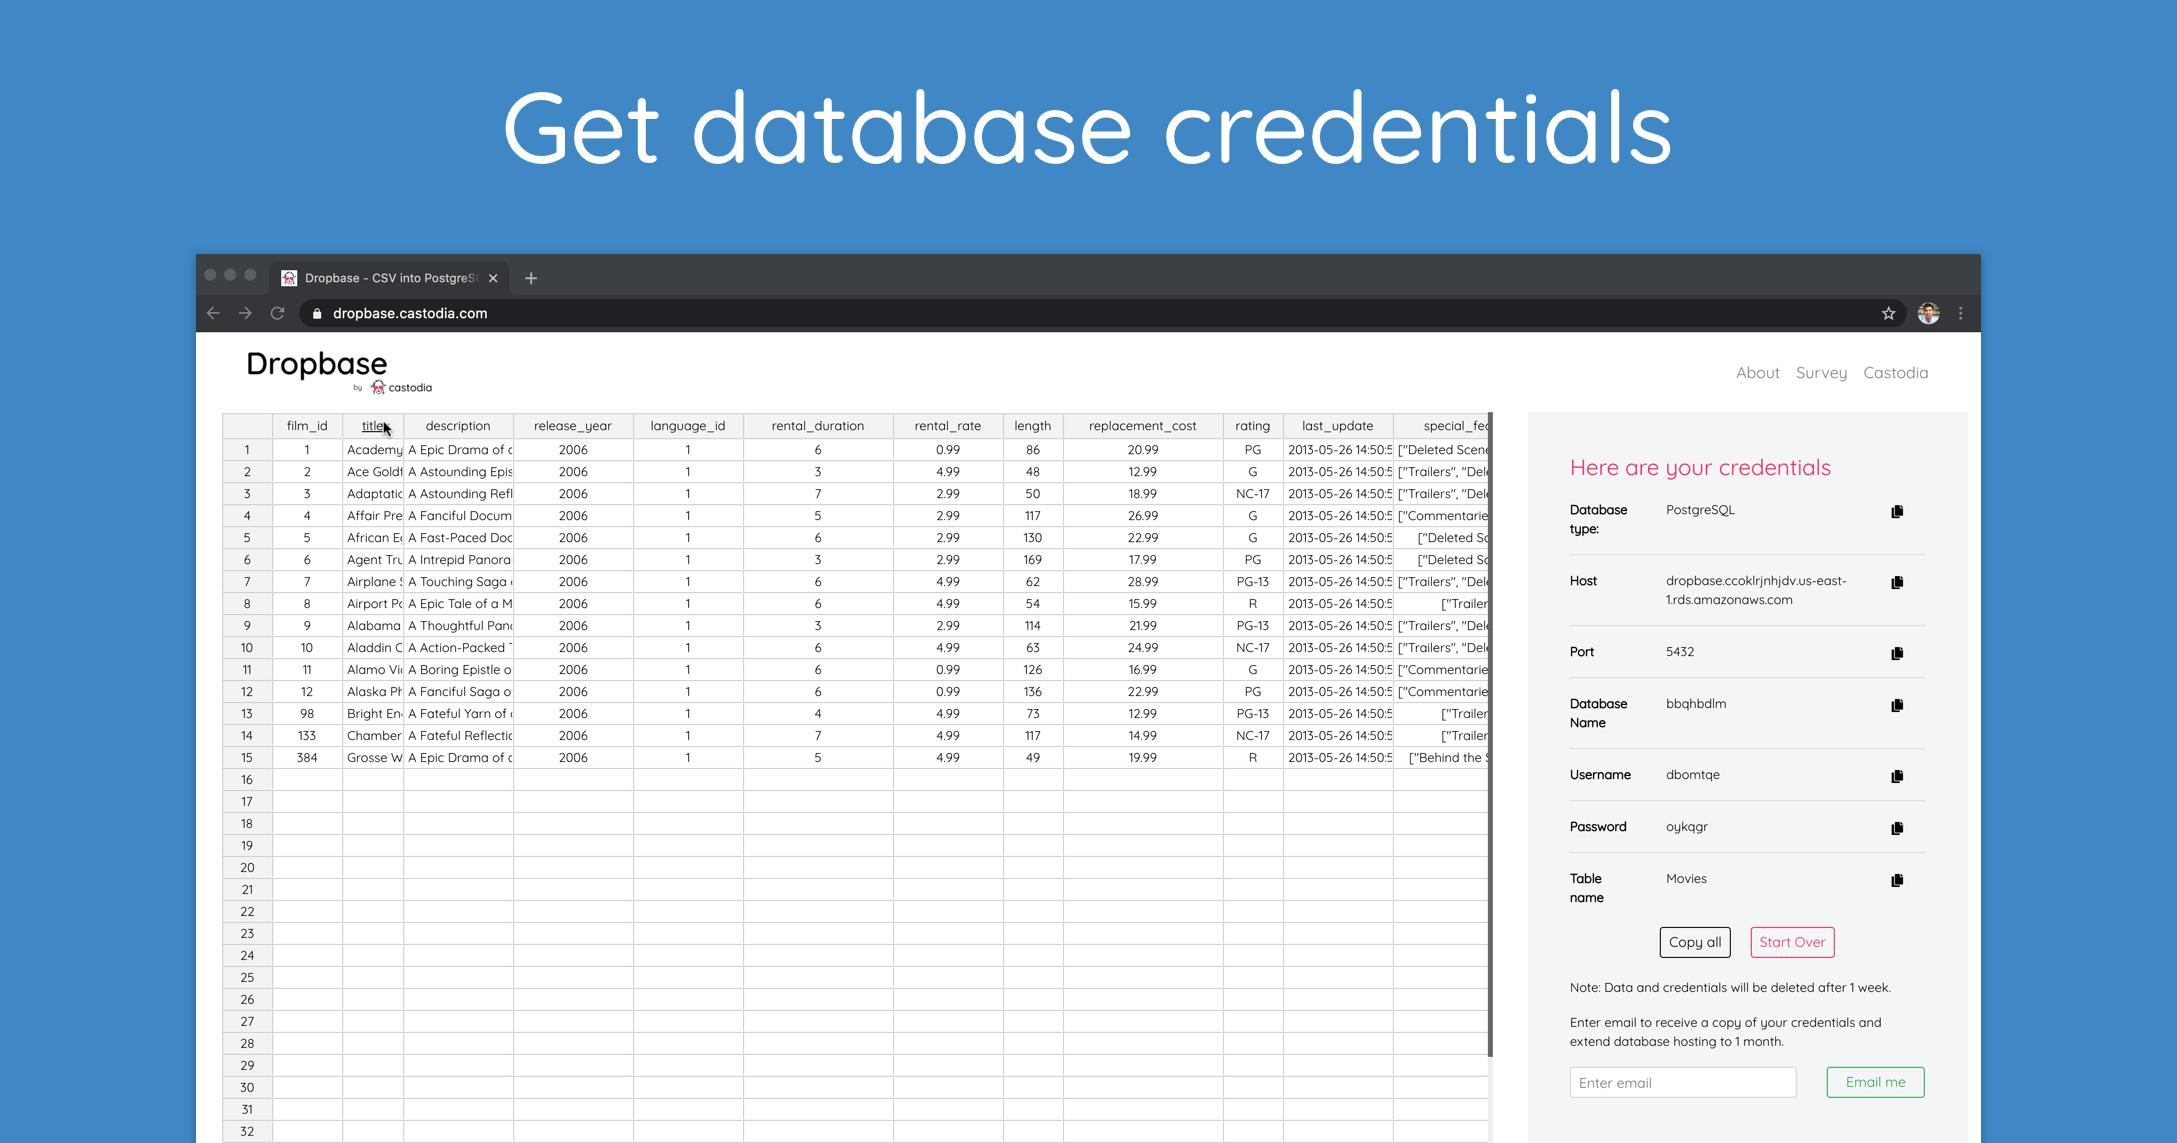 Get database credentials